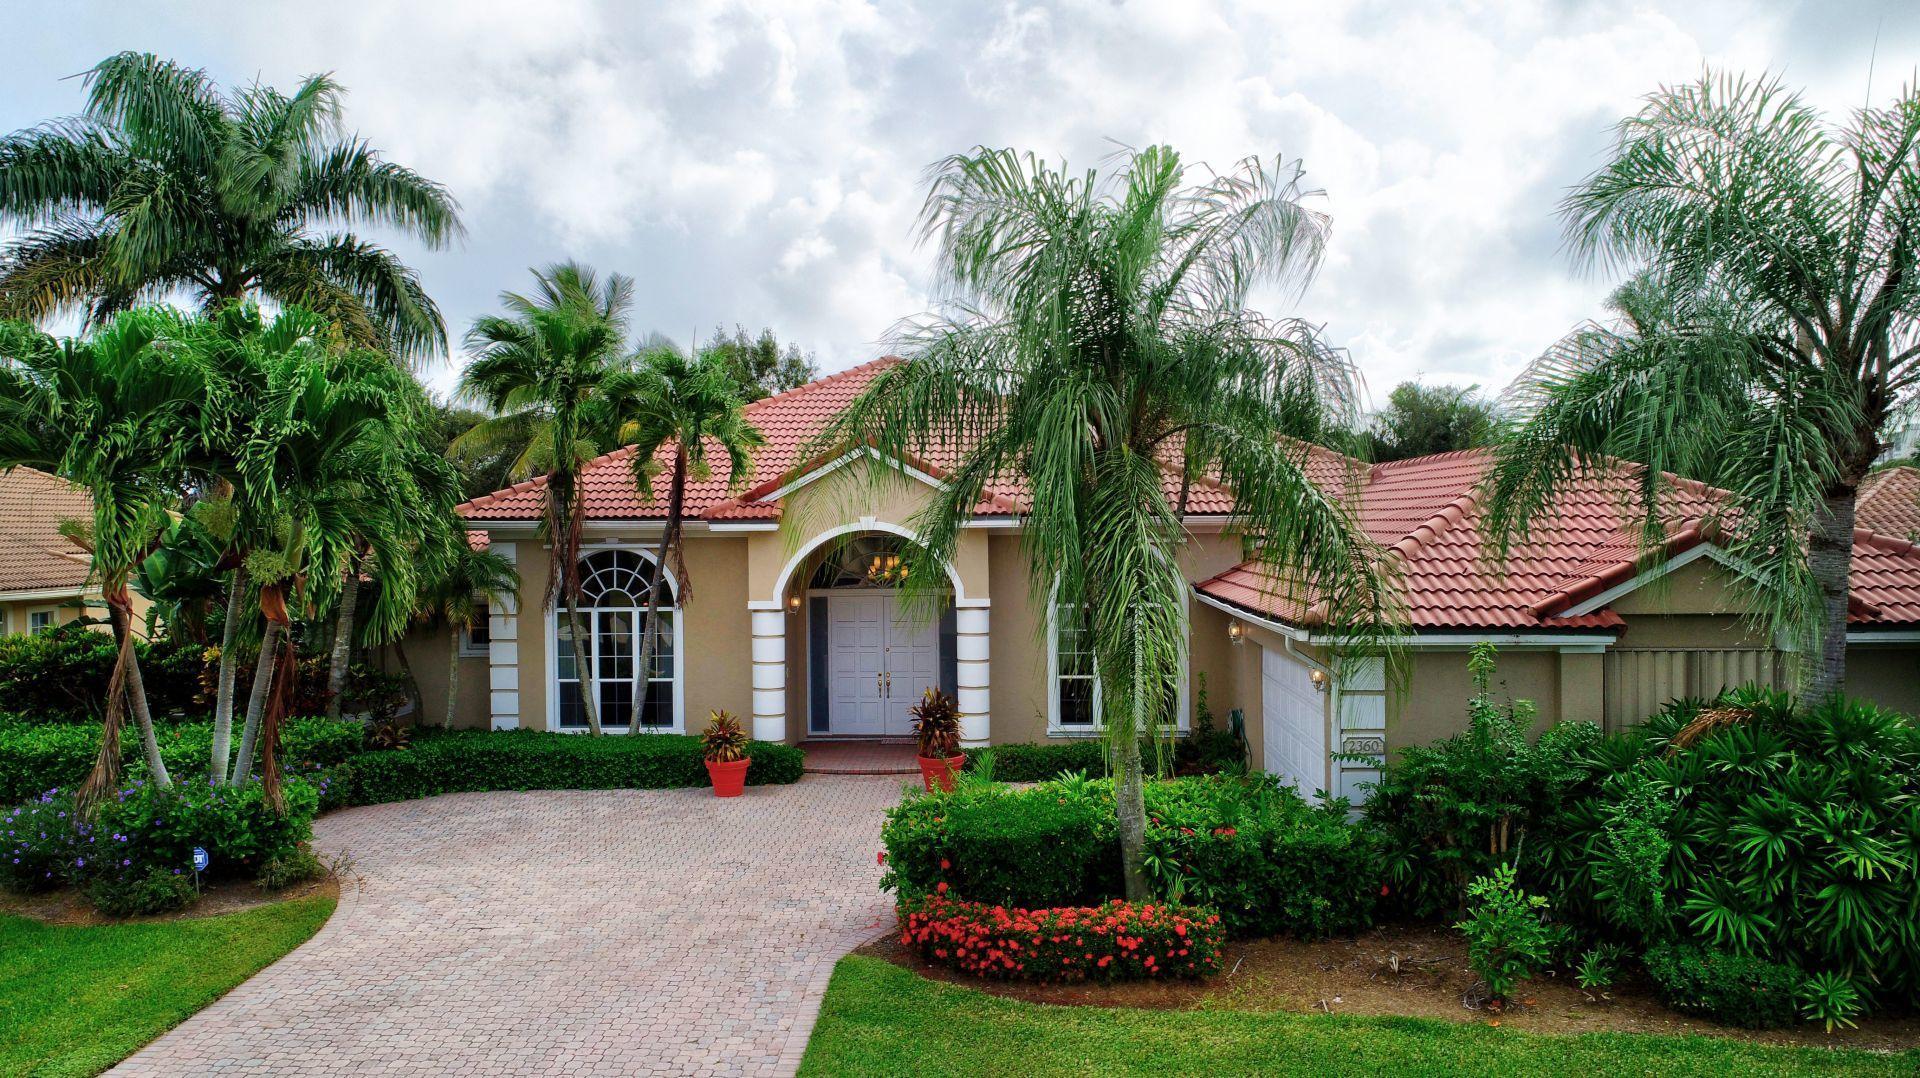 Photo of 2360 Tecumseh Drive, West Palm Beach, FL 33409